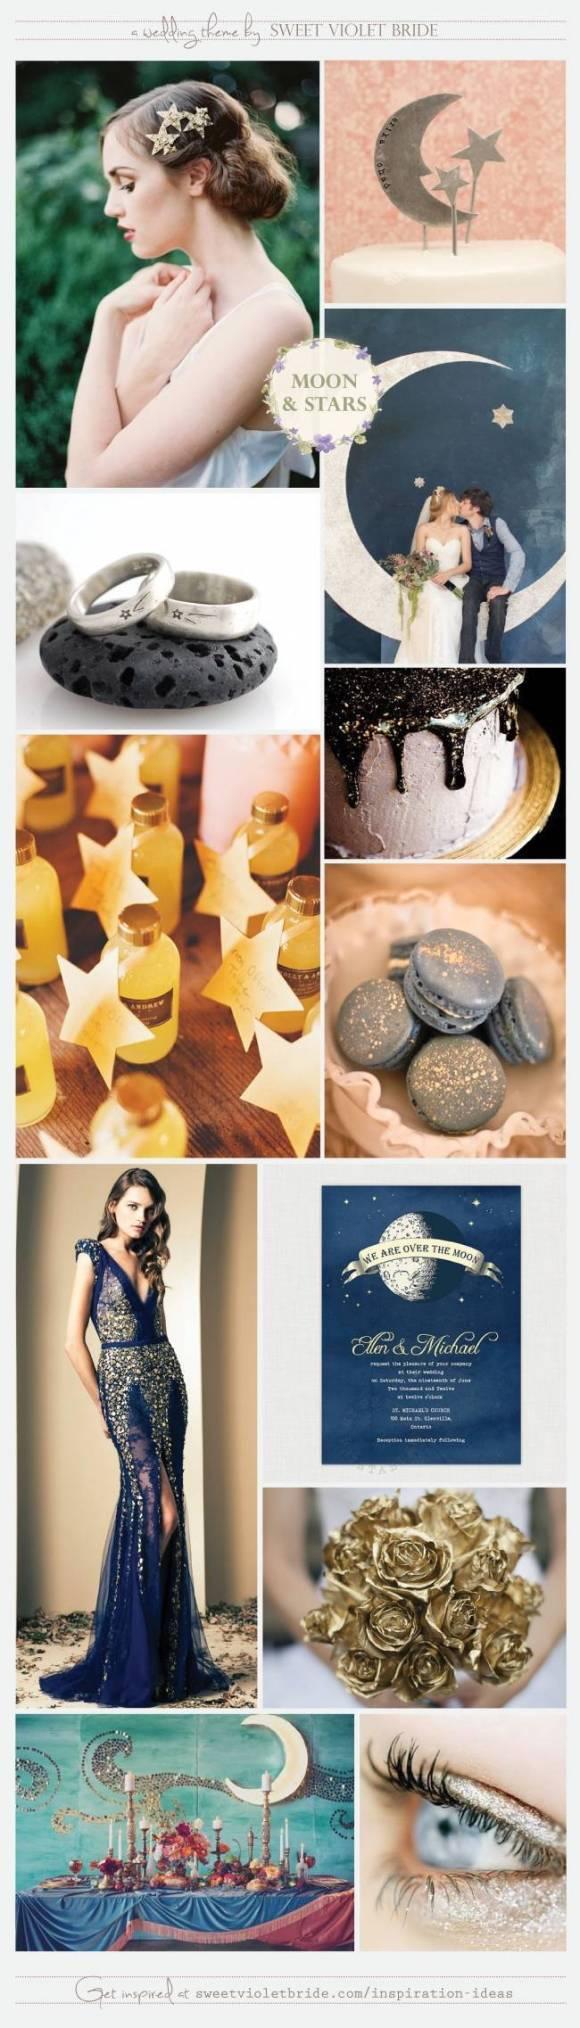 Wedding Inspiration Board 19 Moon & Stars, by Sweet Violet Bride